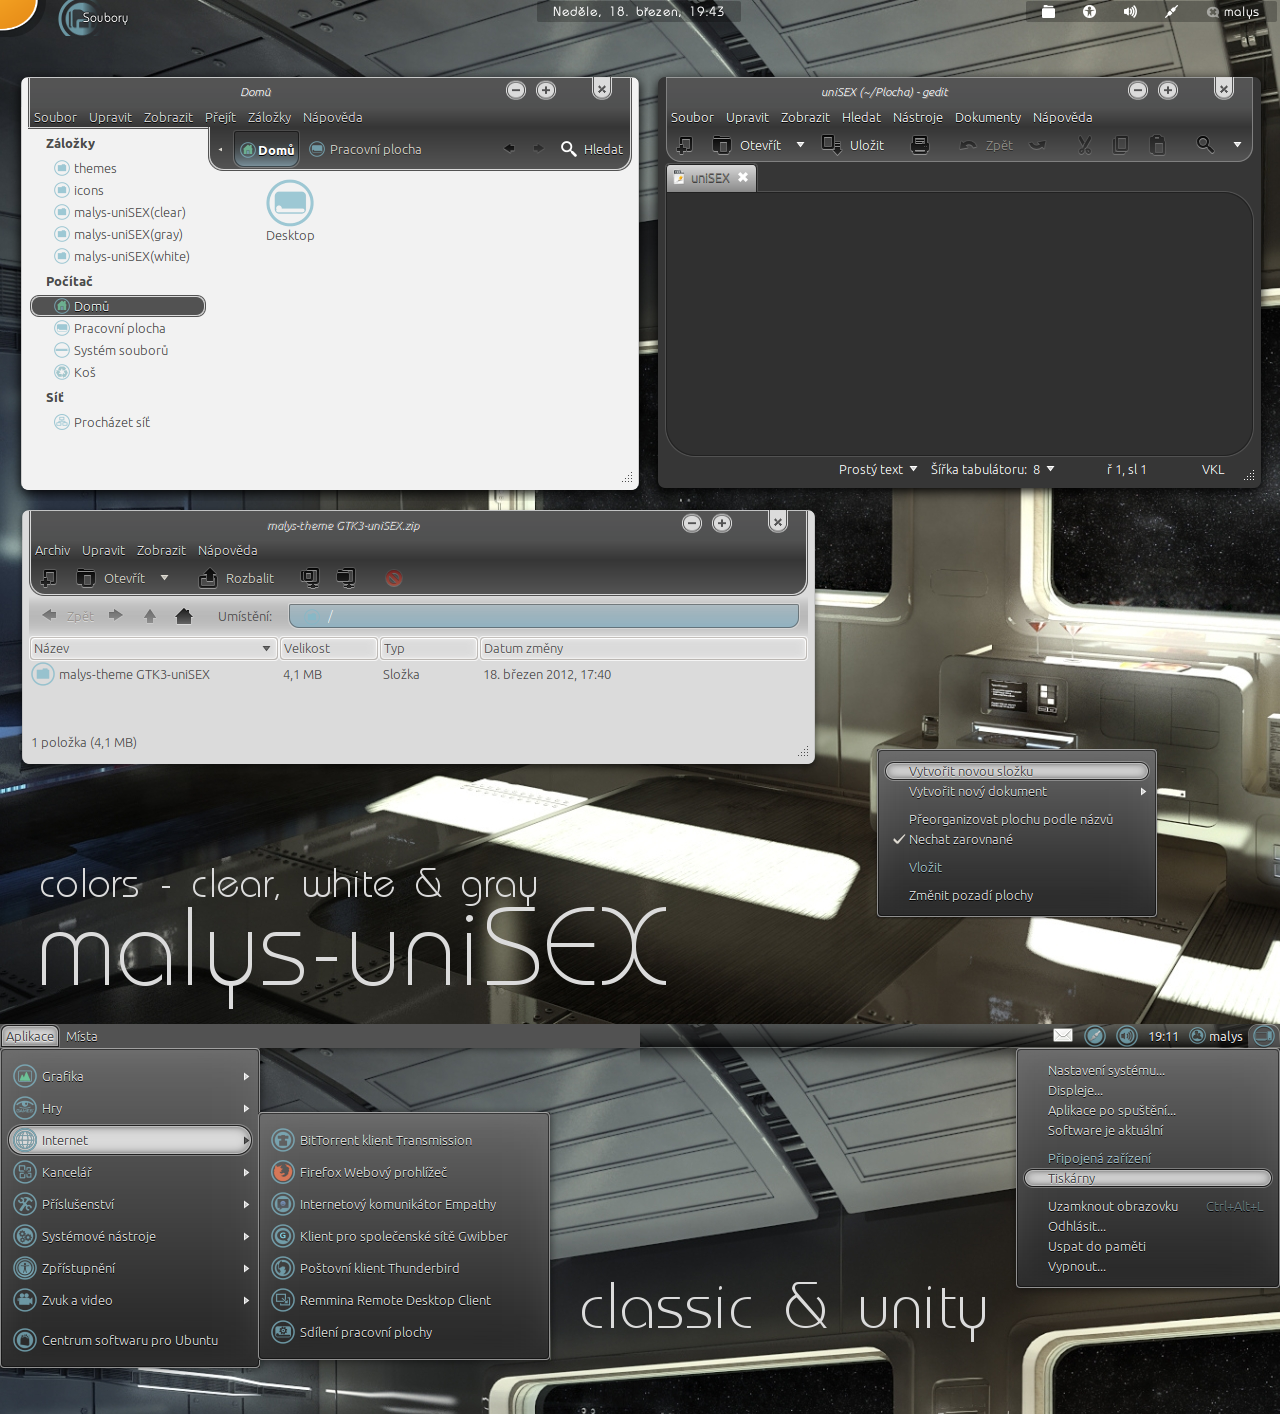 malys - unisex 2.3 by malysss